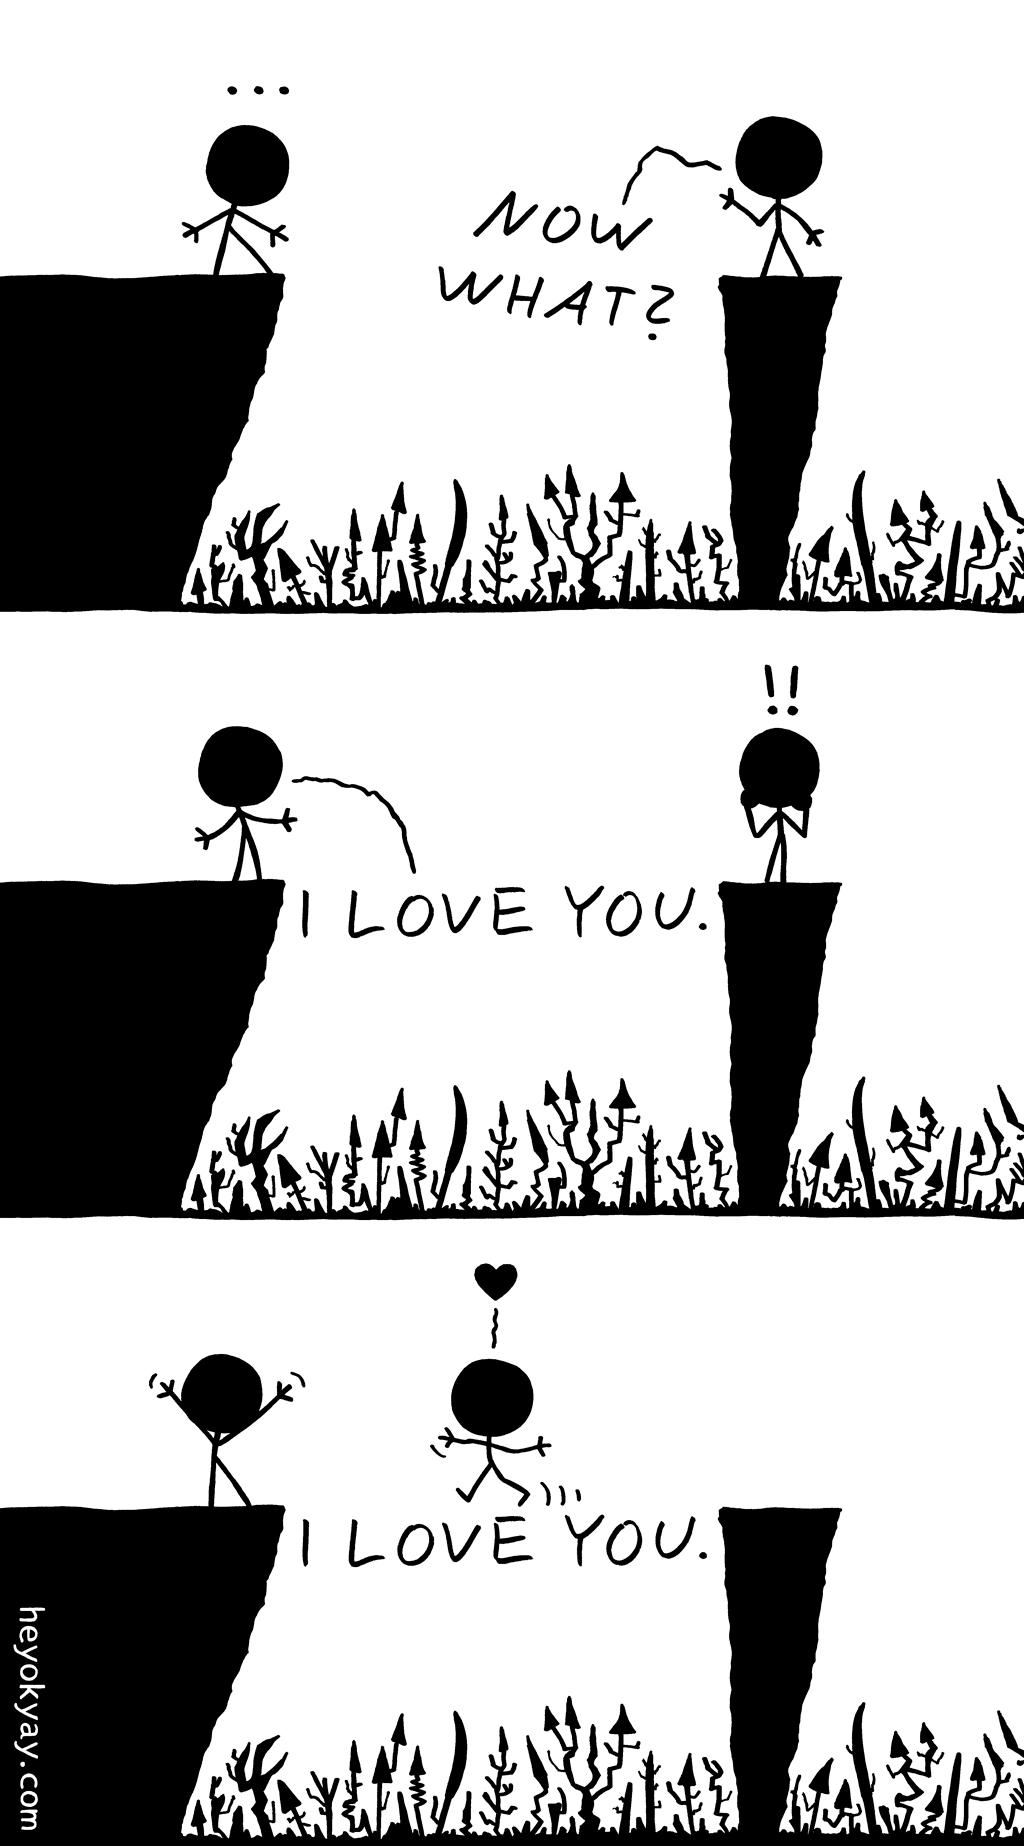 I love you | Hey ok yay? | Now what? I love you. | romance, bridge, loving, loved, in love